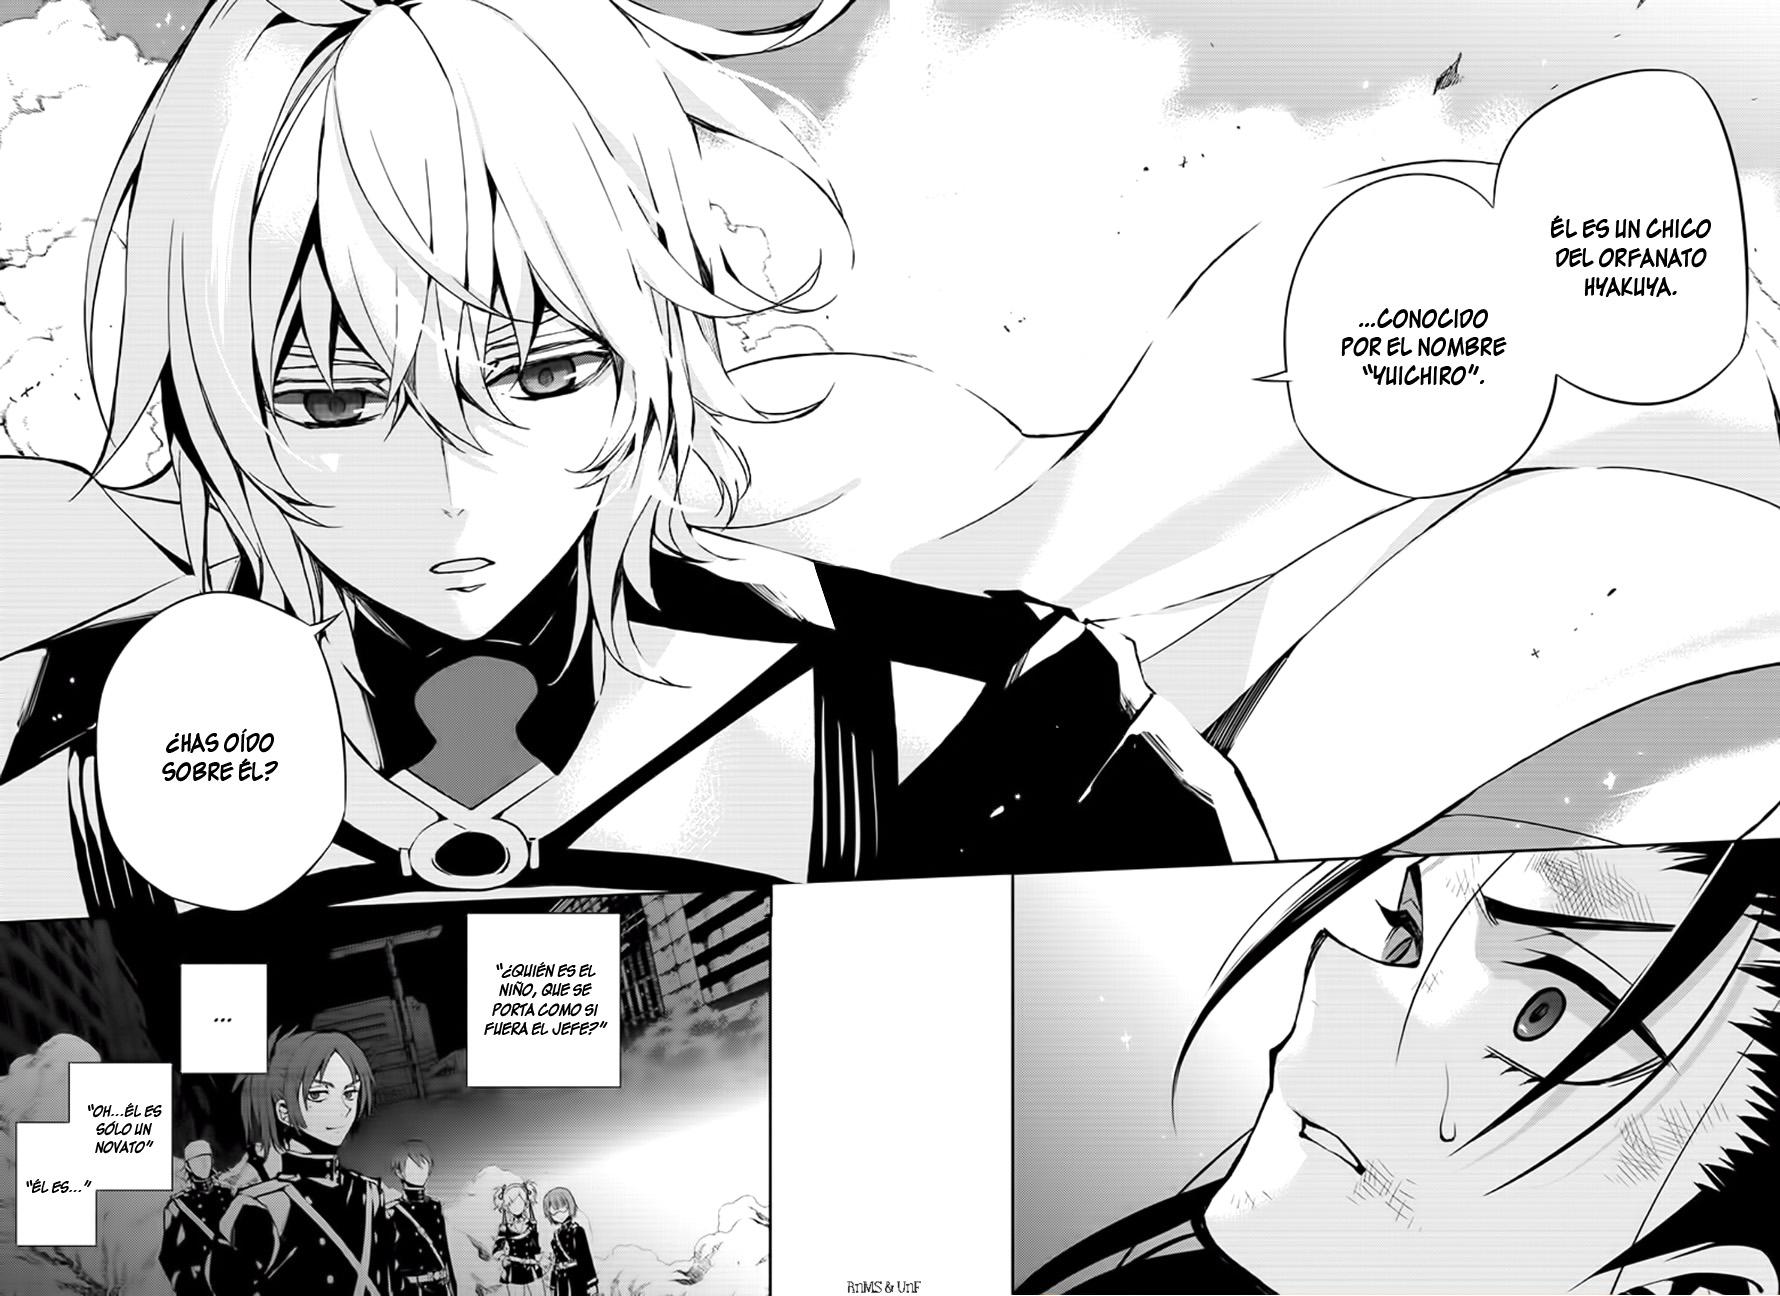 http://c5.ninemanga.com/es_manga/49/3057/354598/8f0ca6a7afda126df10bedb633192388.jpg Page 10